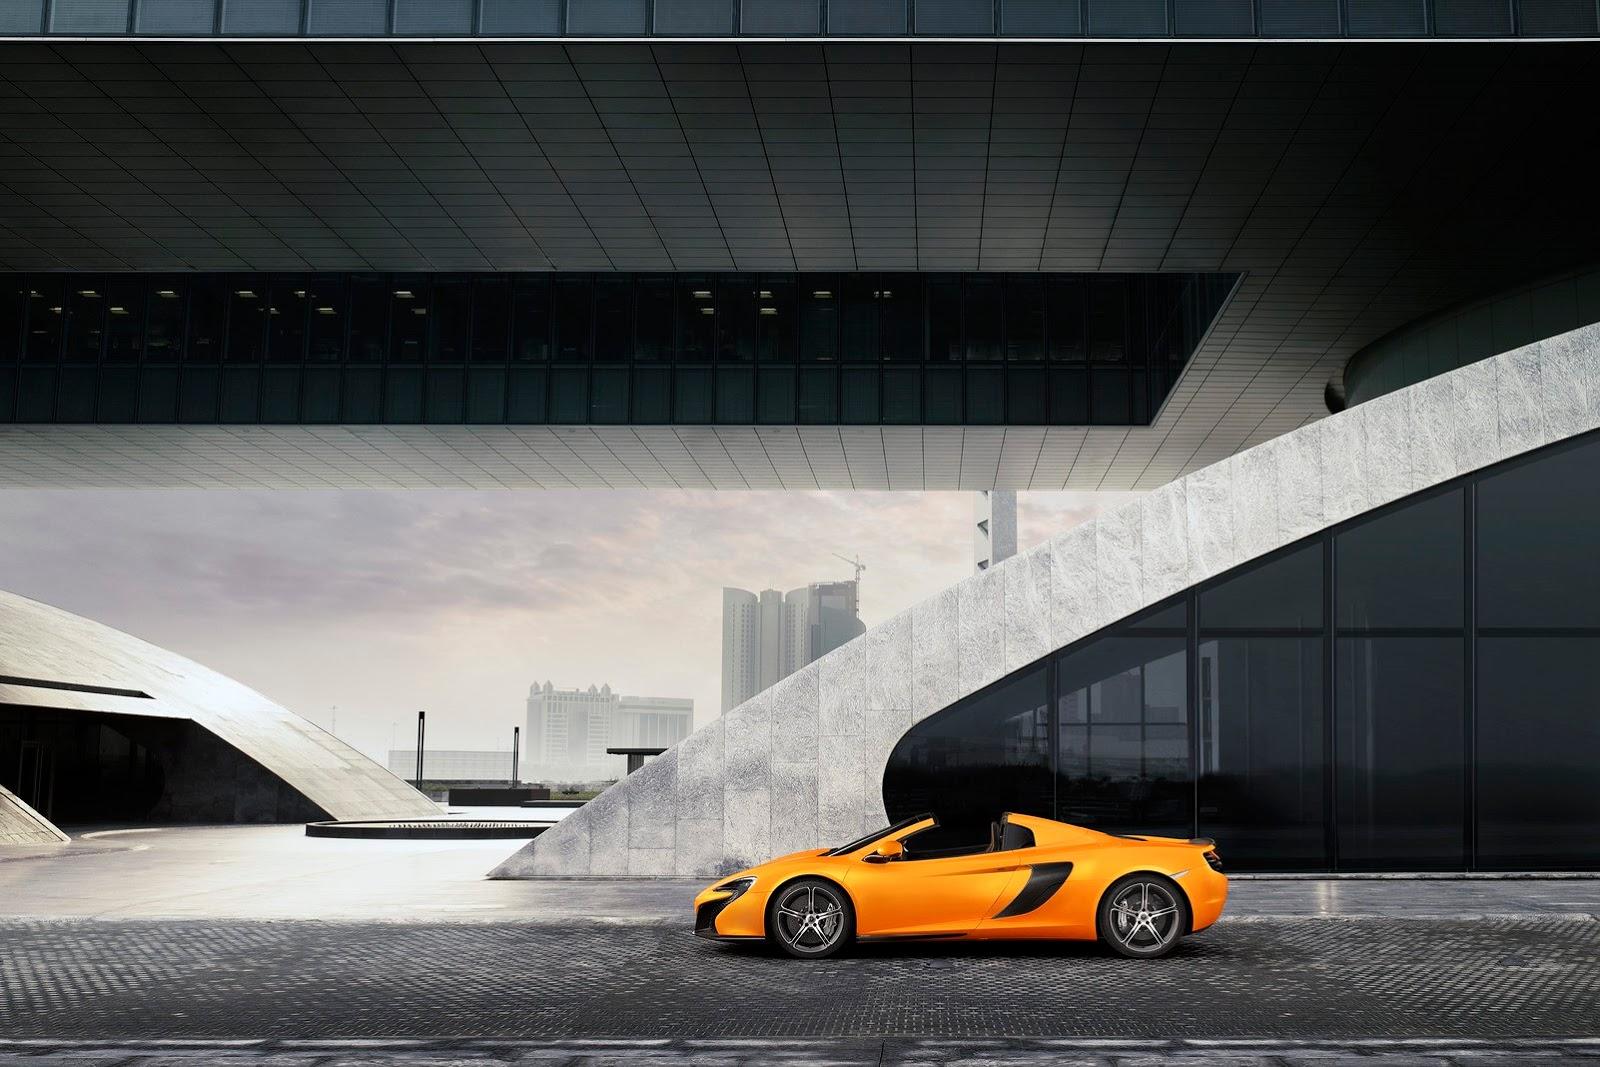 McLaren-65-S-4%25255B2%25255D.jpg